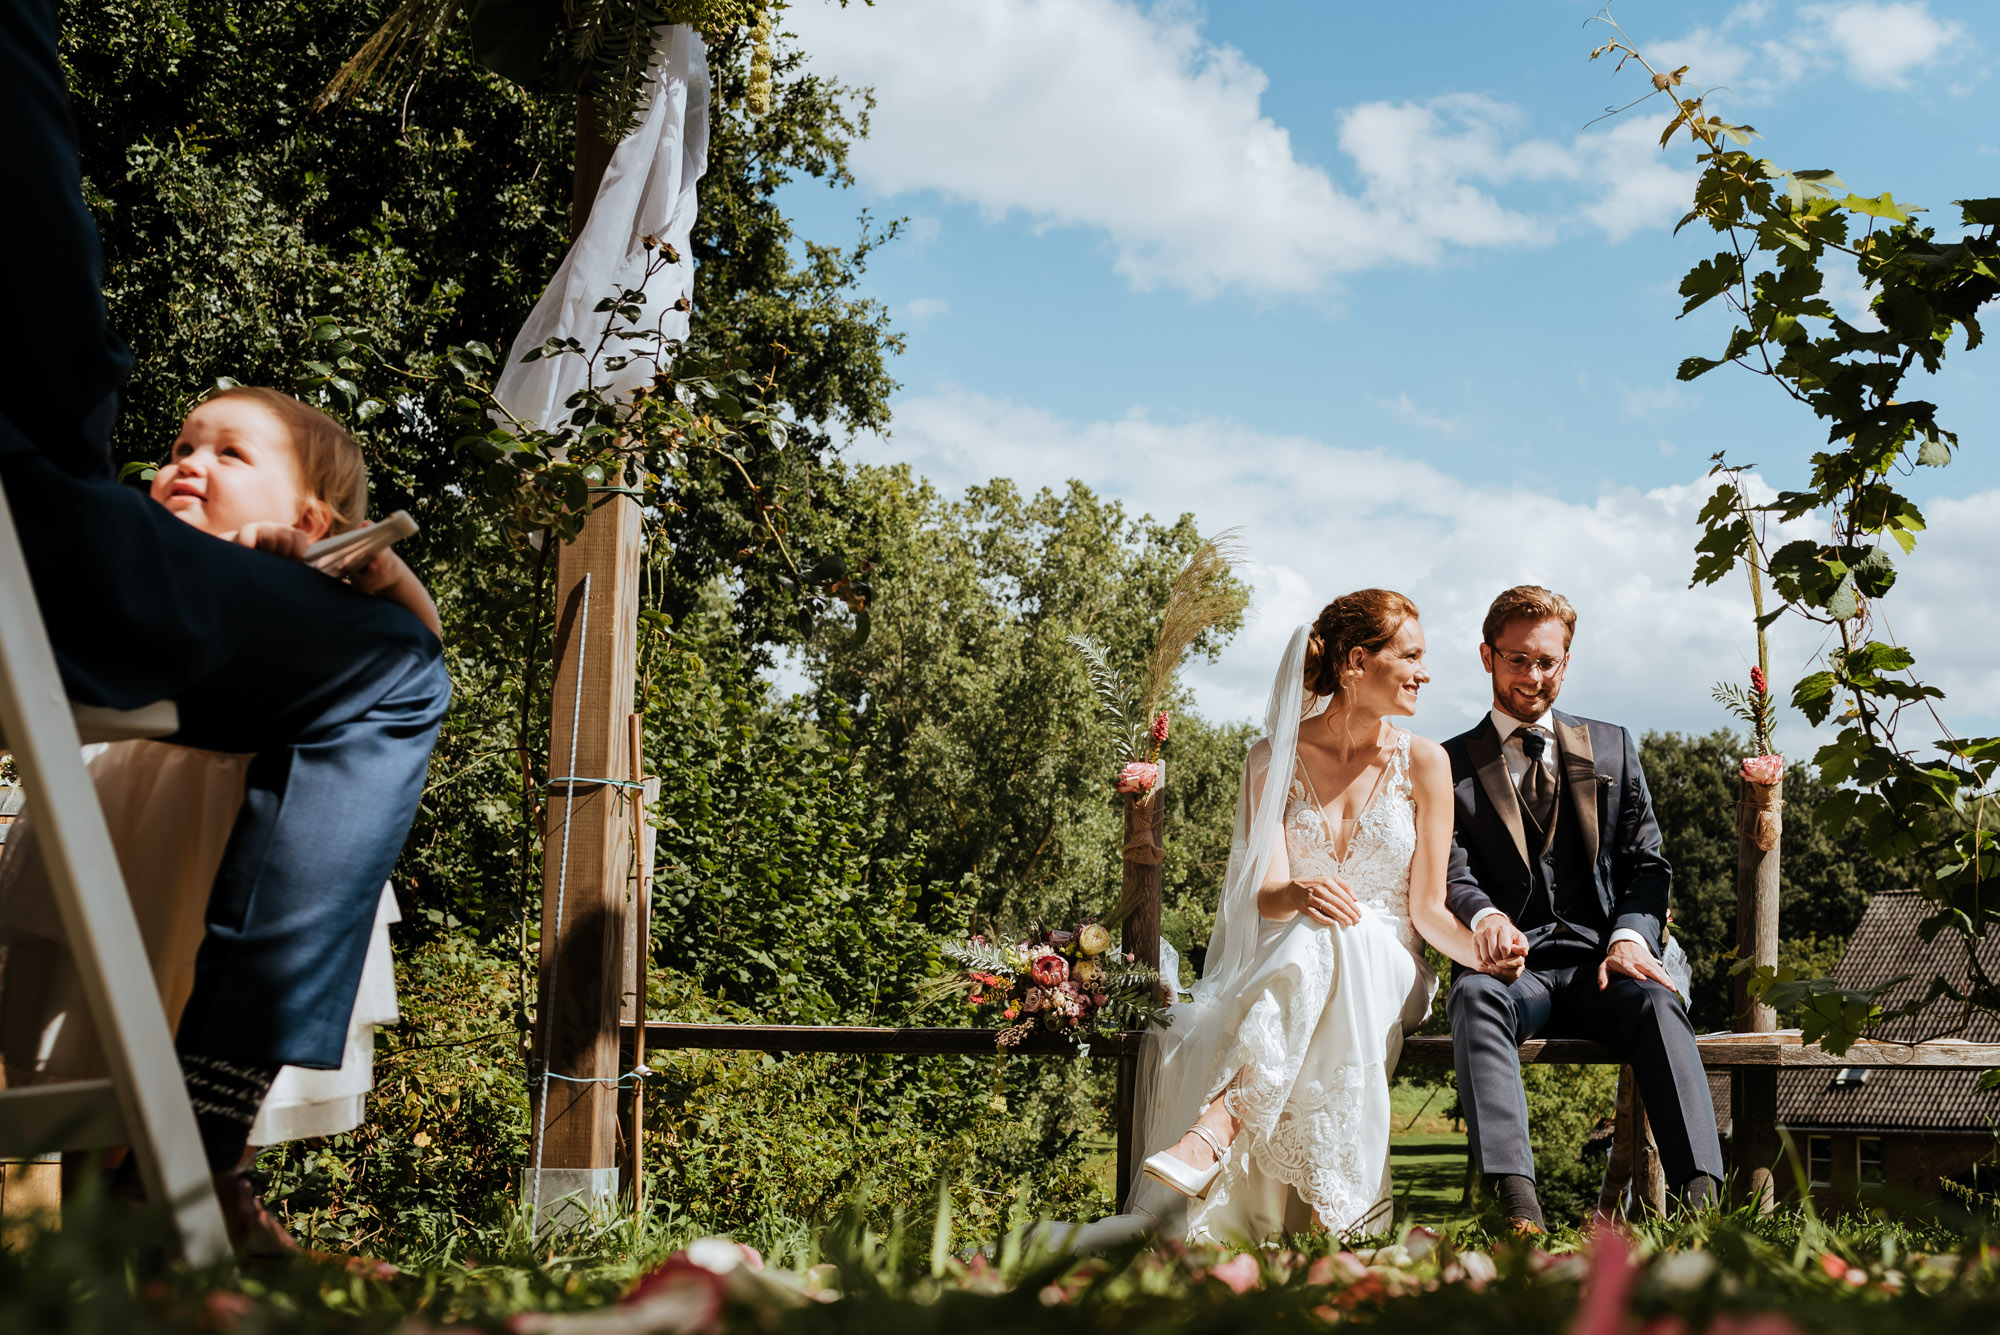 Documentaire-stijl-bruidsfotografie